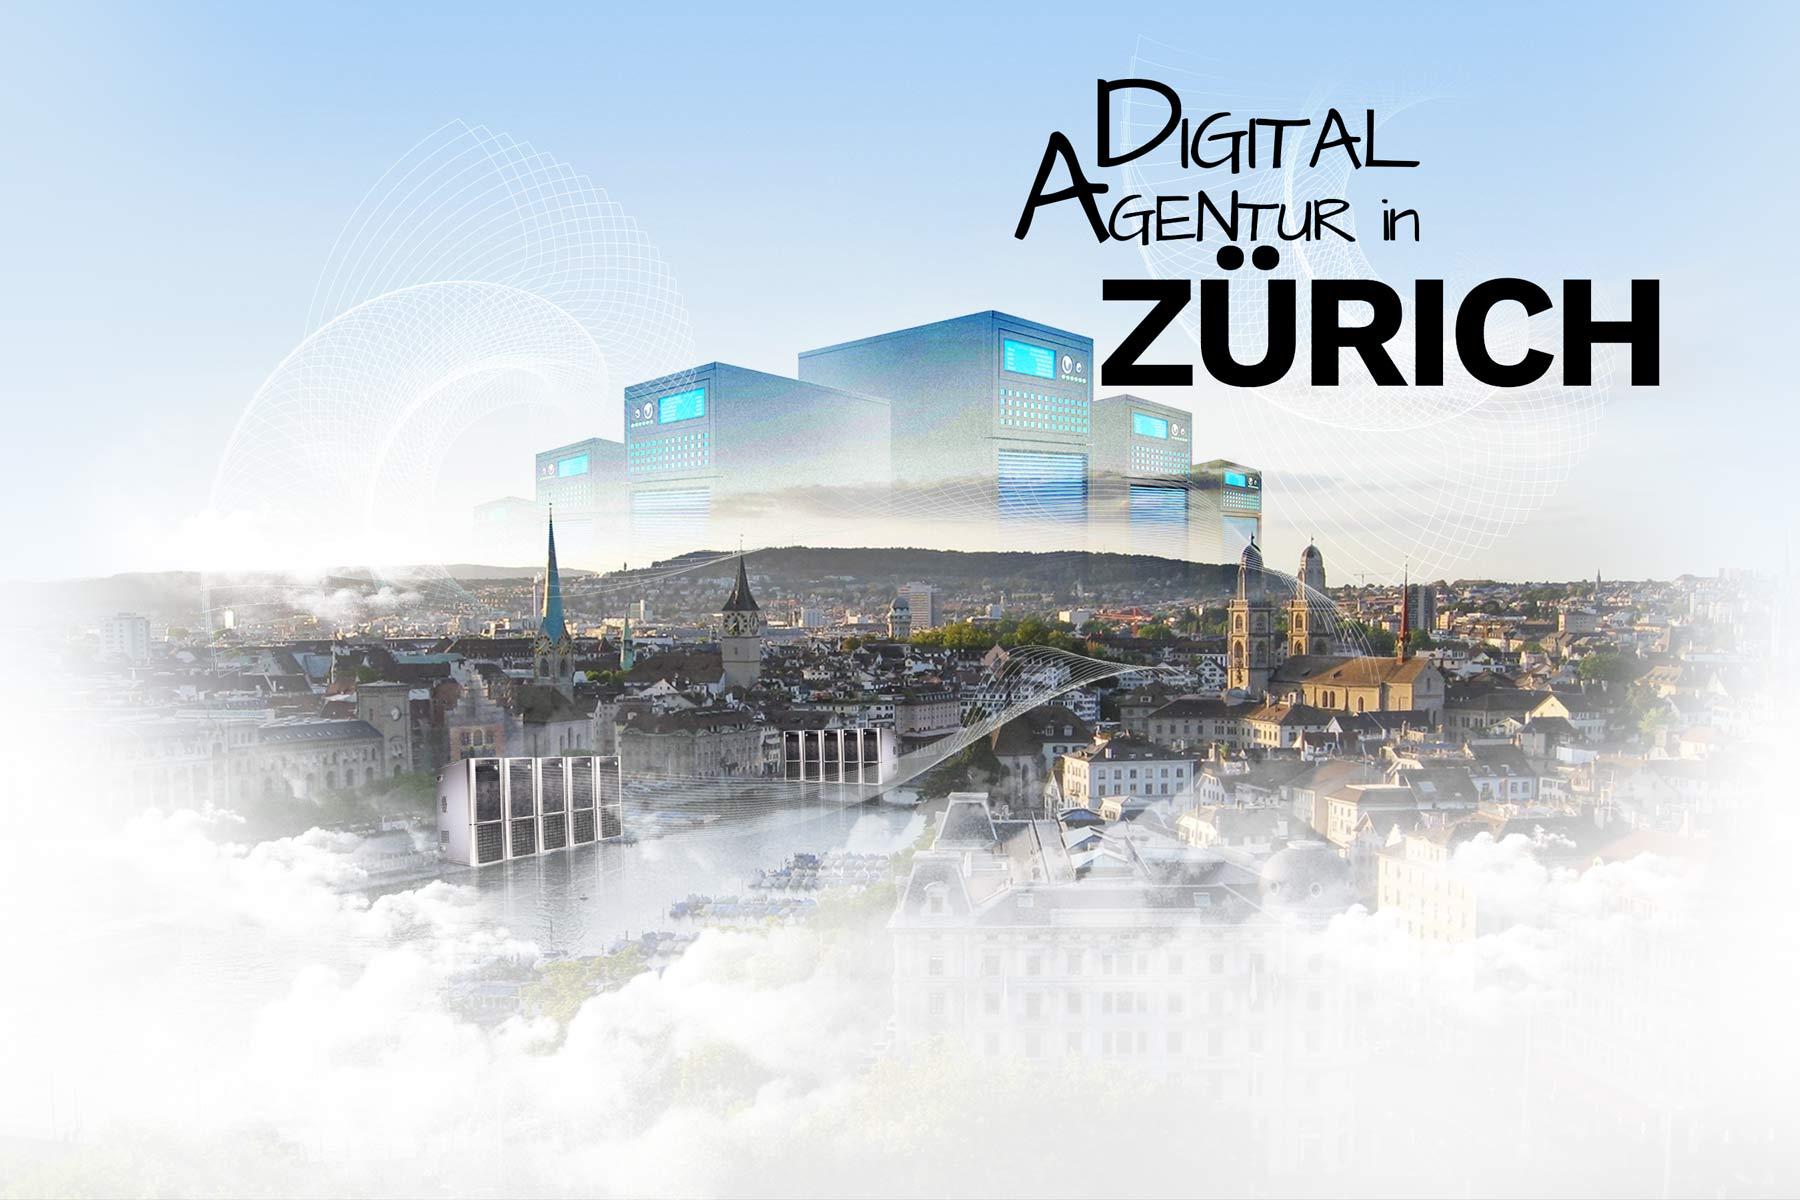 Attic Solutions - Digital Agentur Zürich